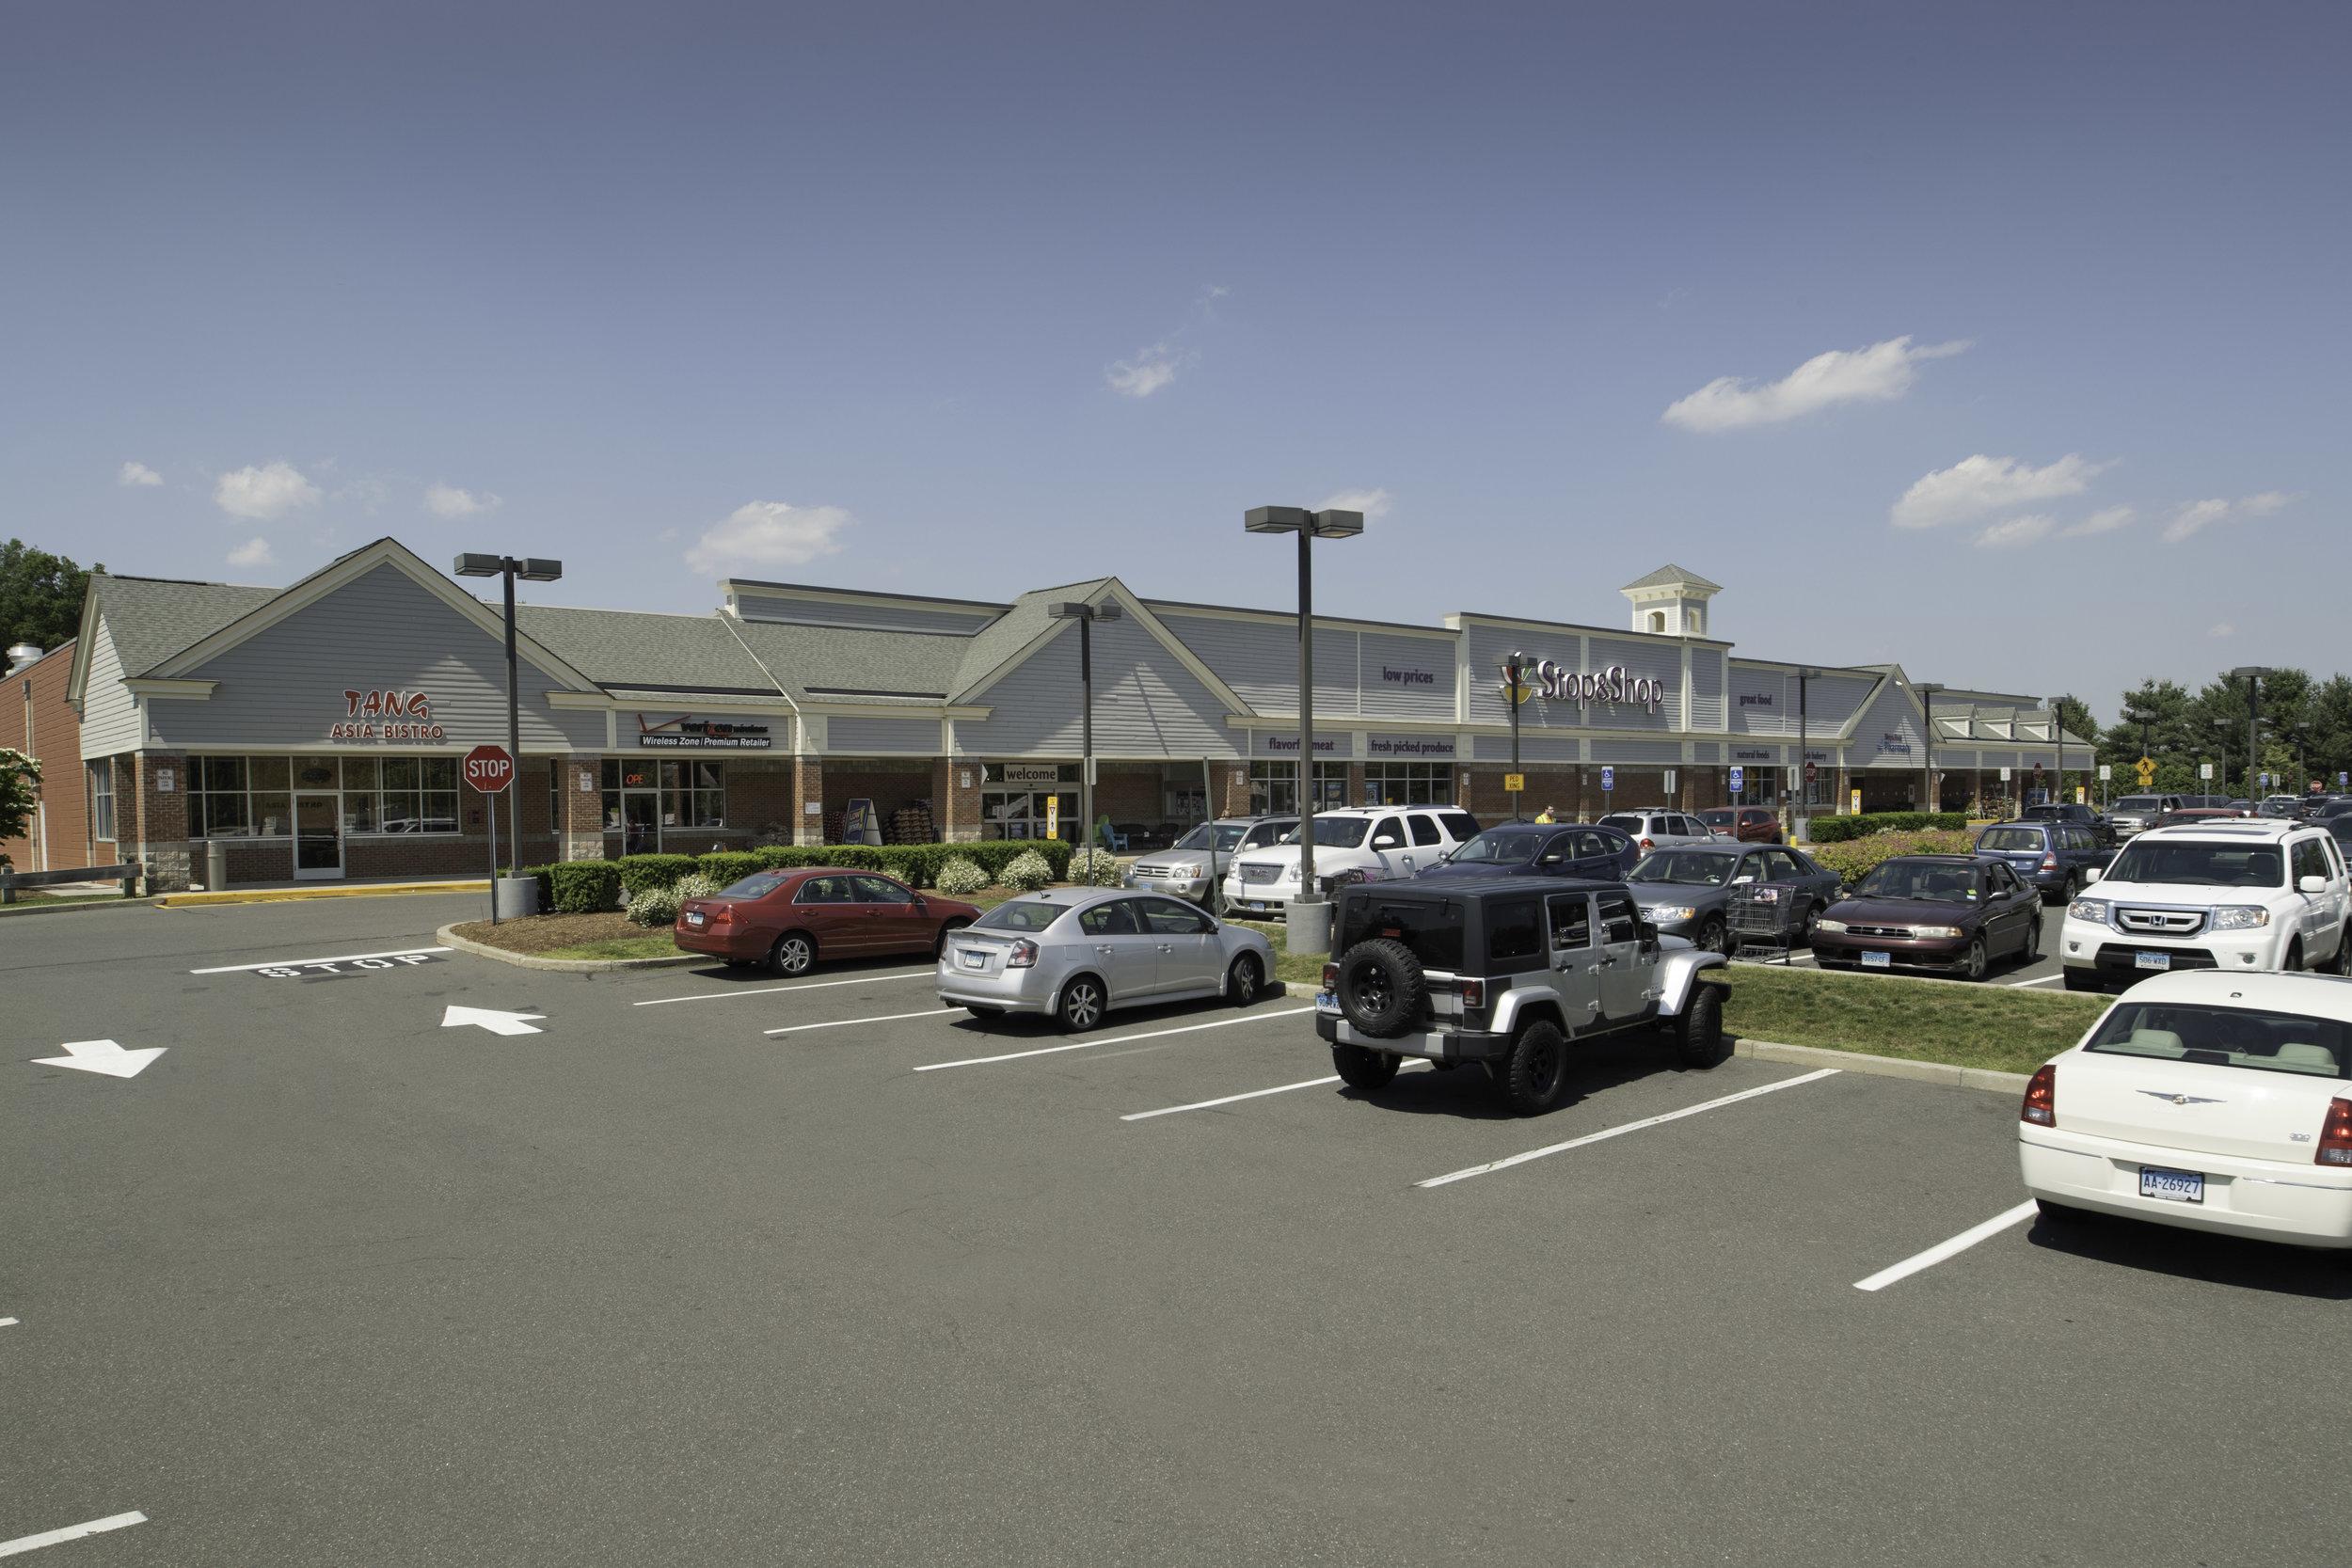 CPI East Hampton Plaza_002.jpg